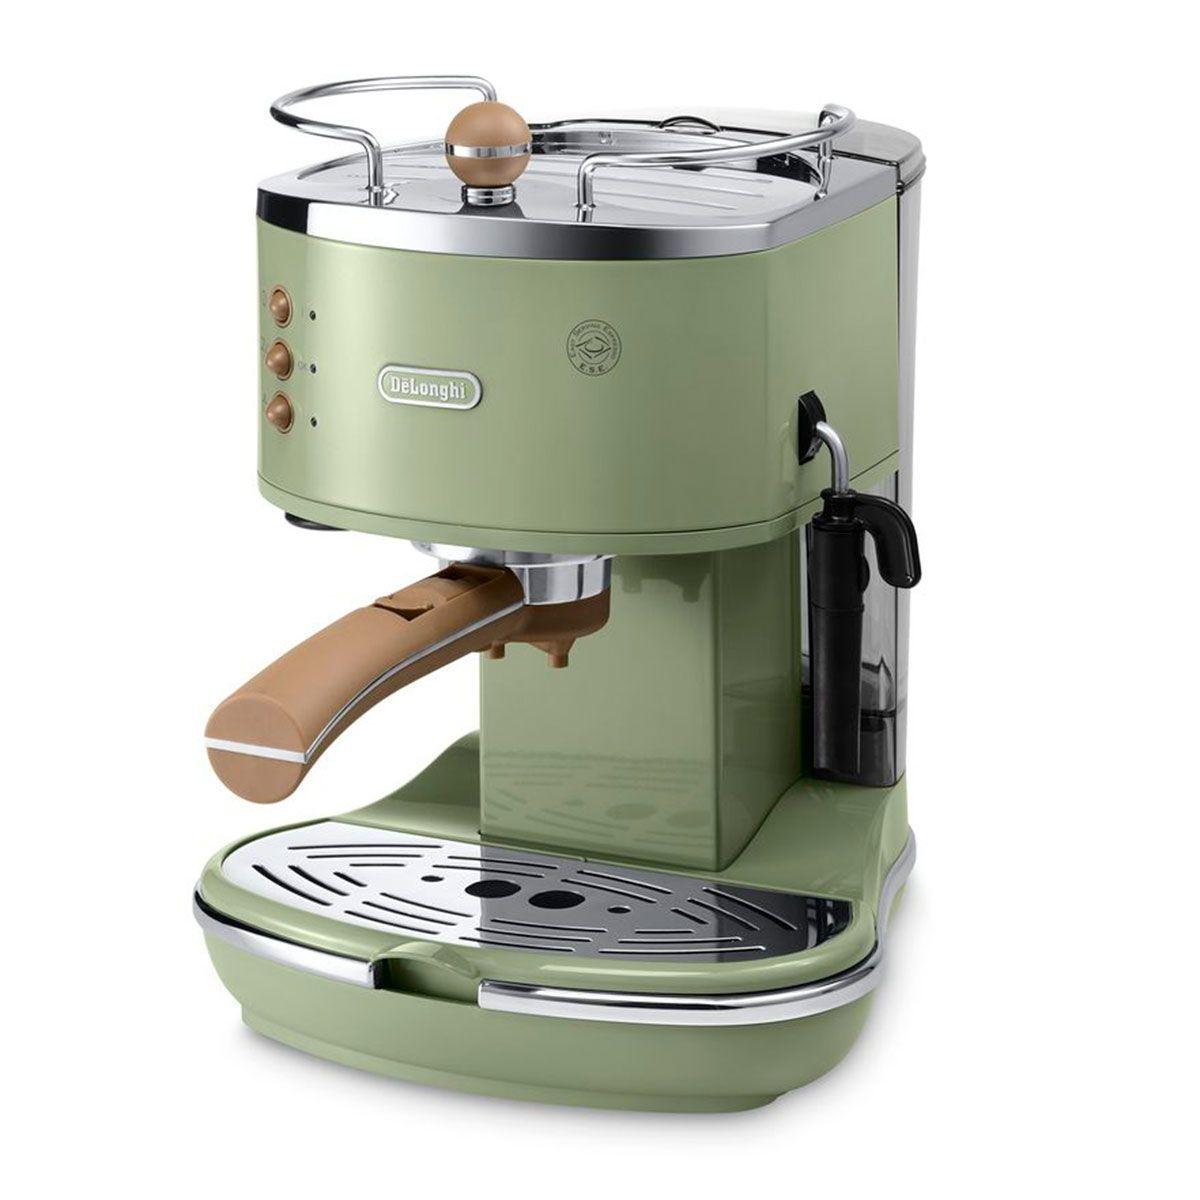 Delonghi Icona Vintage Ecov 310 Coffee Machine Delonghi